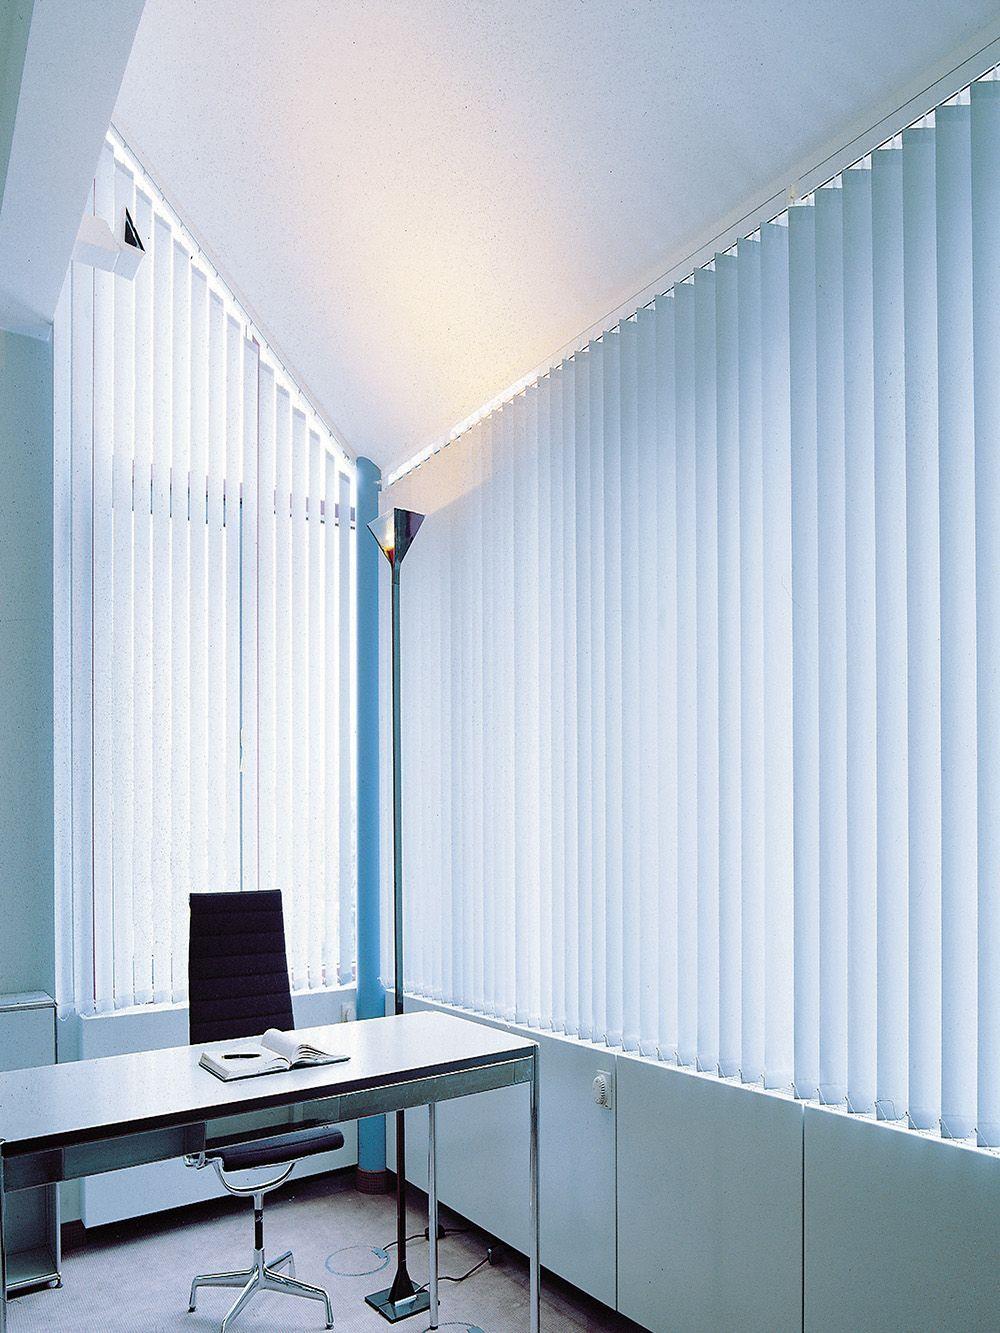 Fabric blinds simple bathroom blinds indoor shuttersbamboo blinds